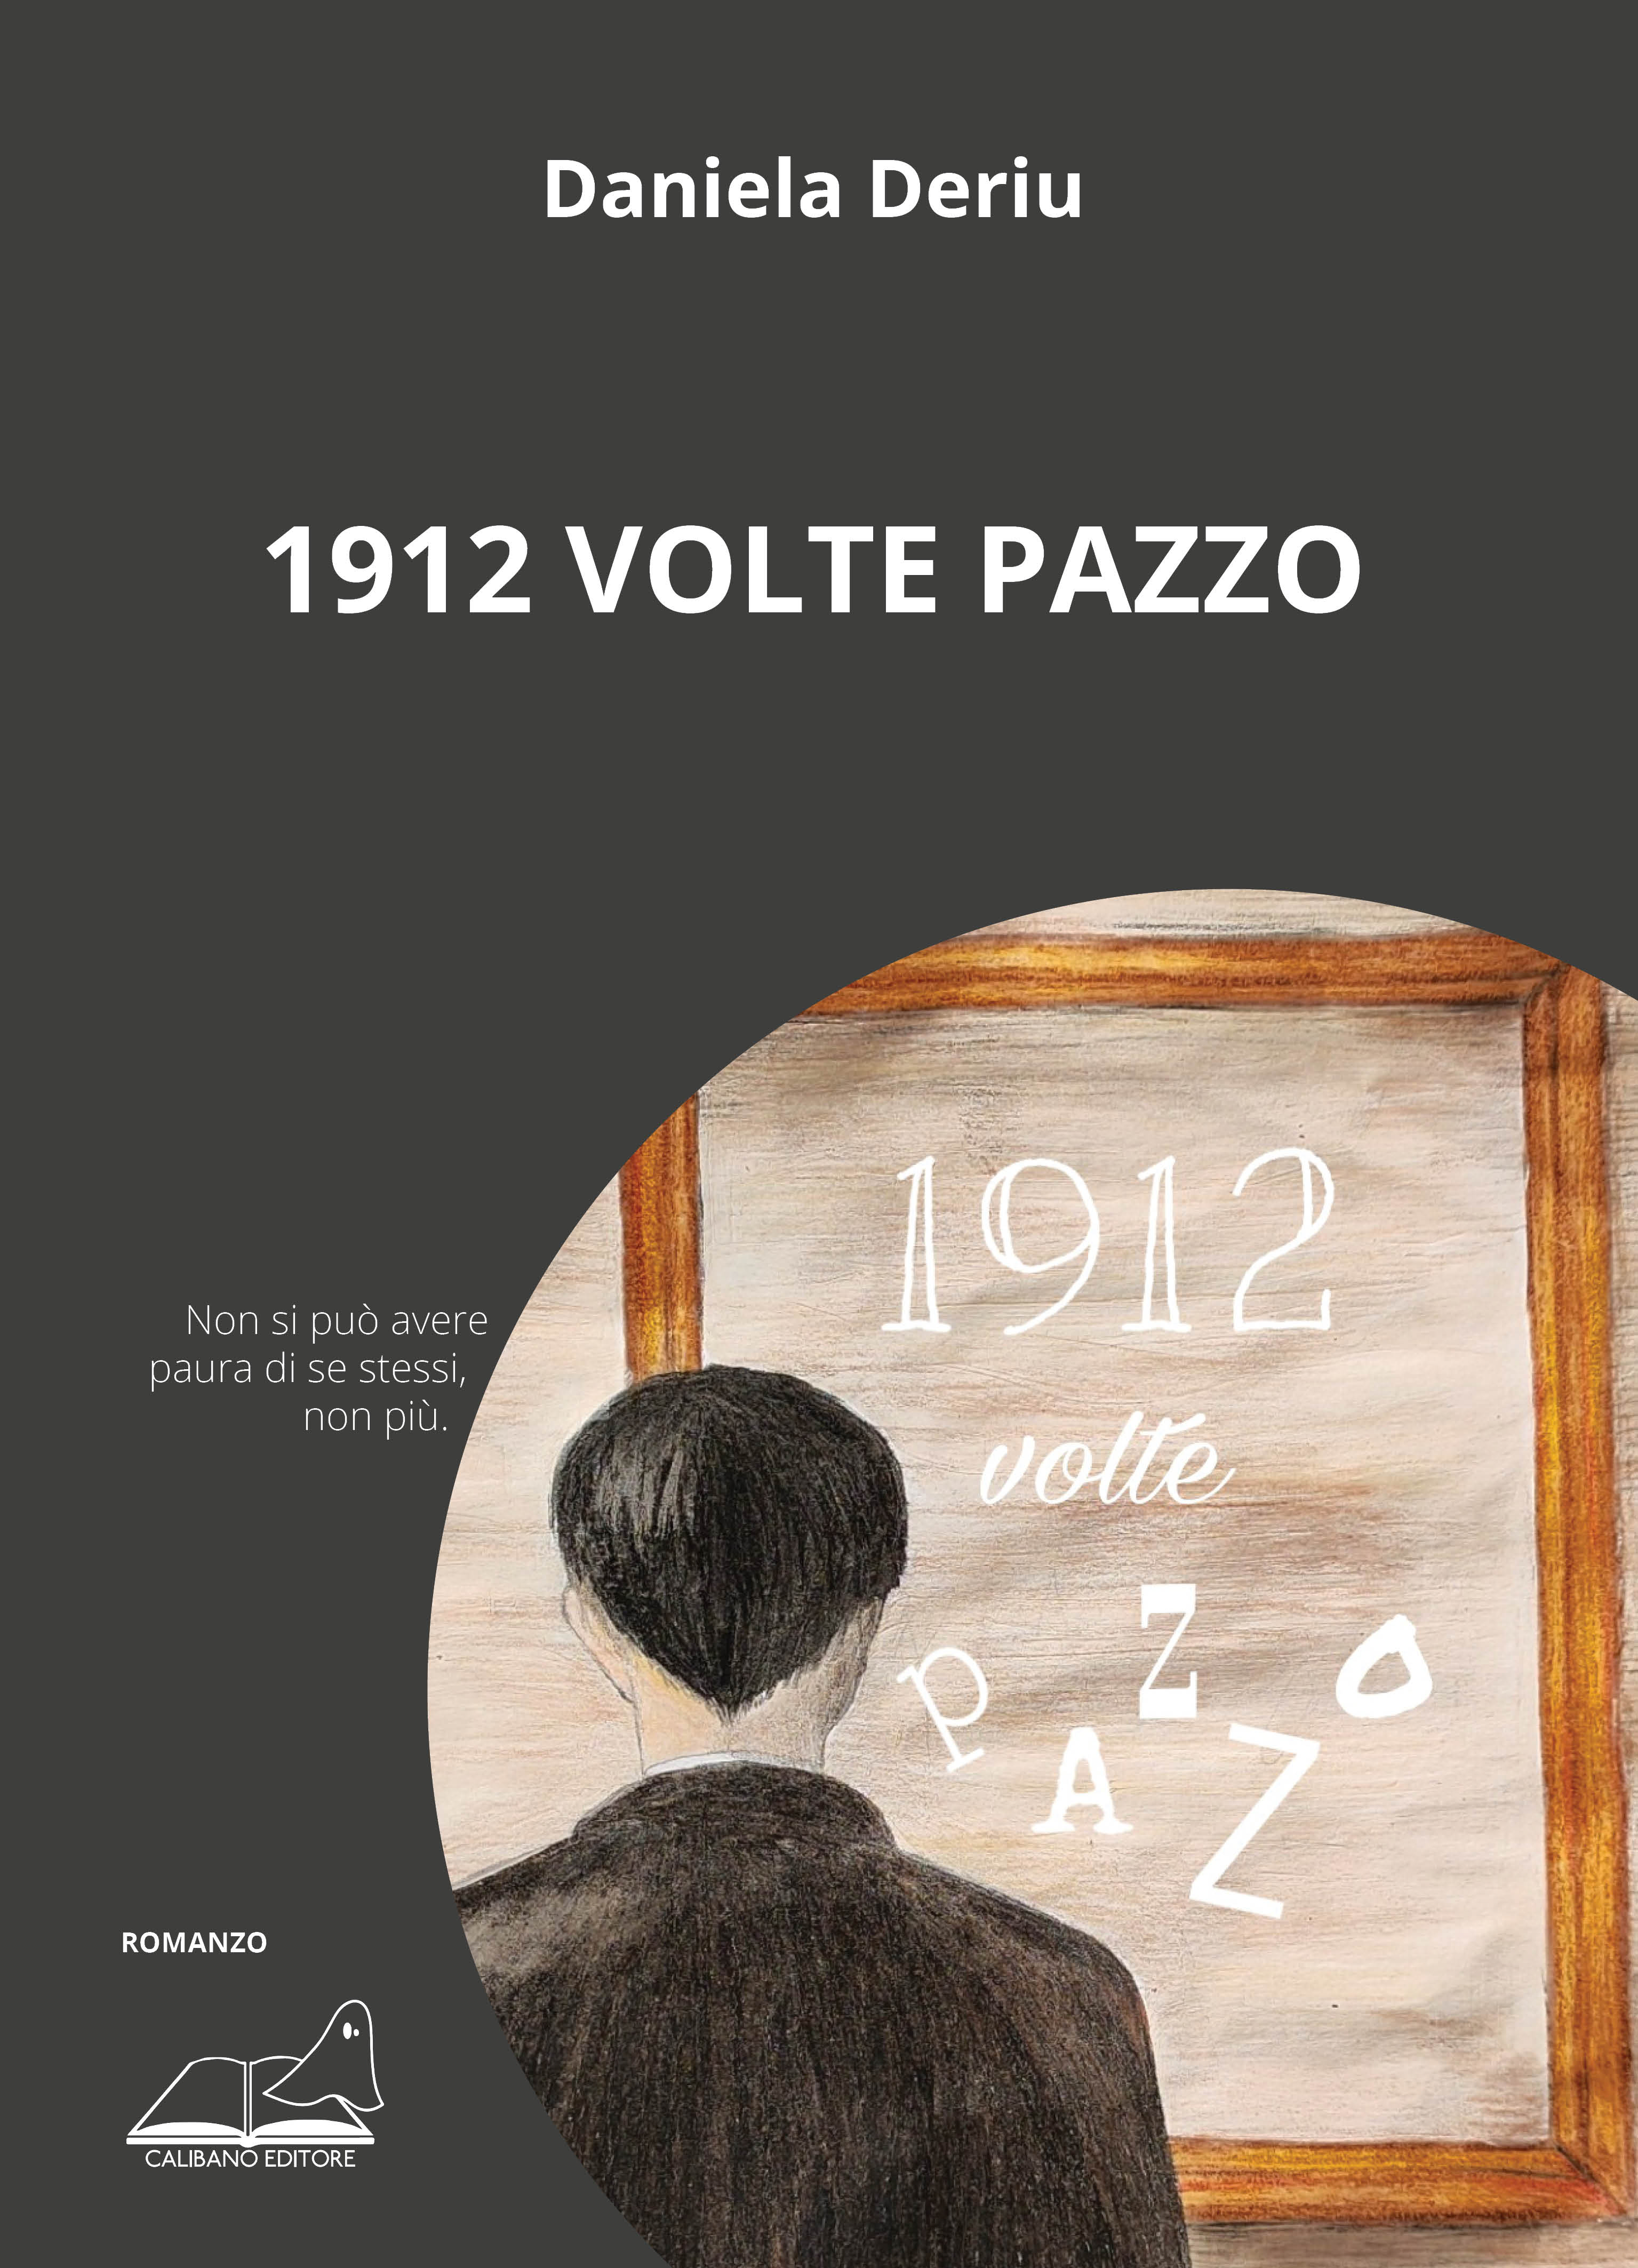 1912 volte pazzo-image-1%>